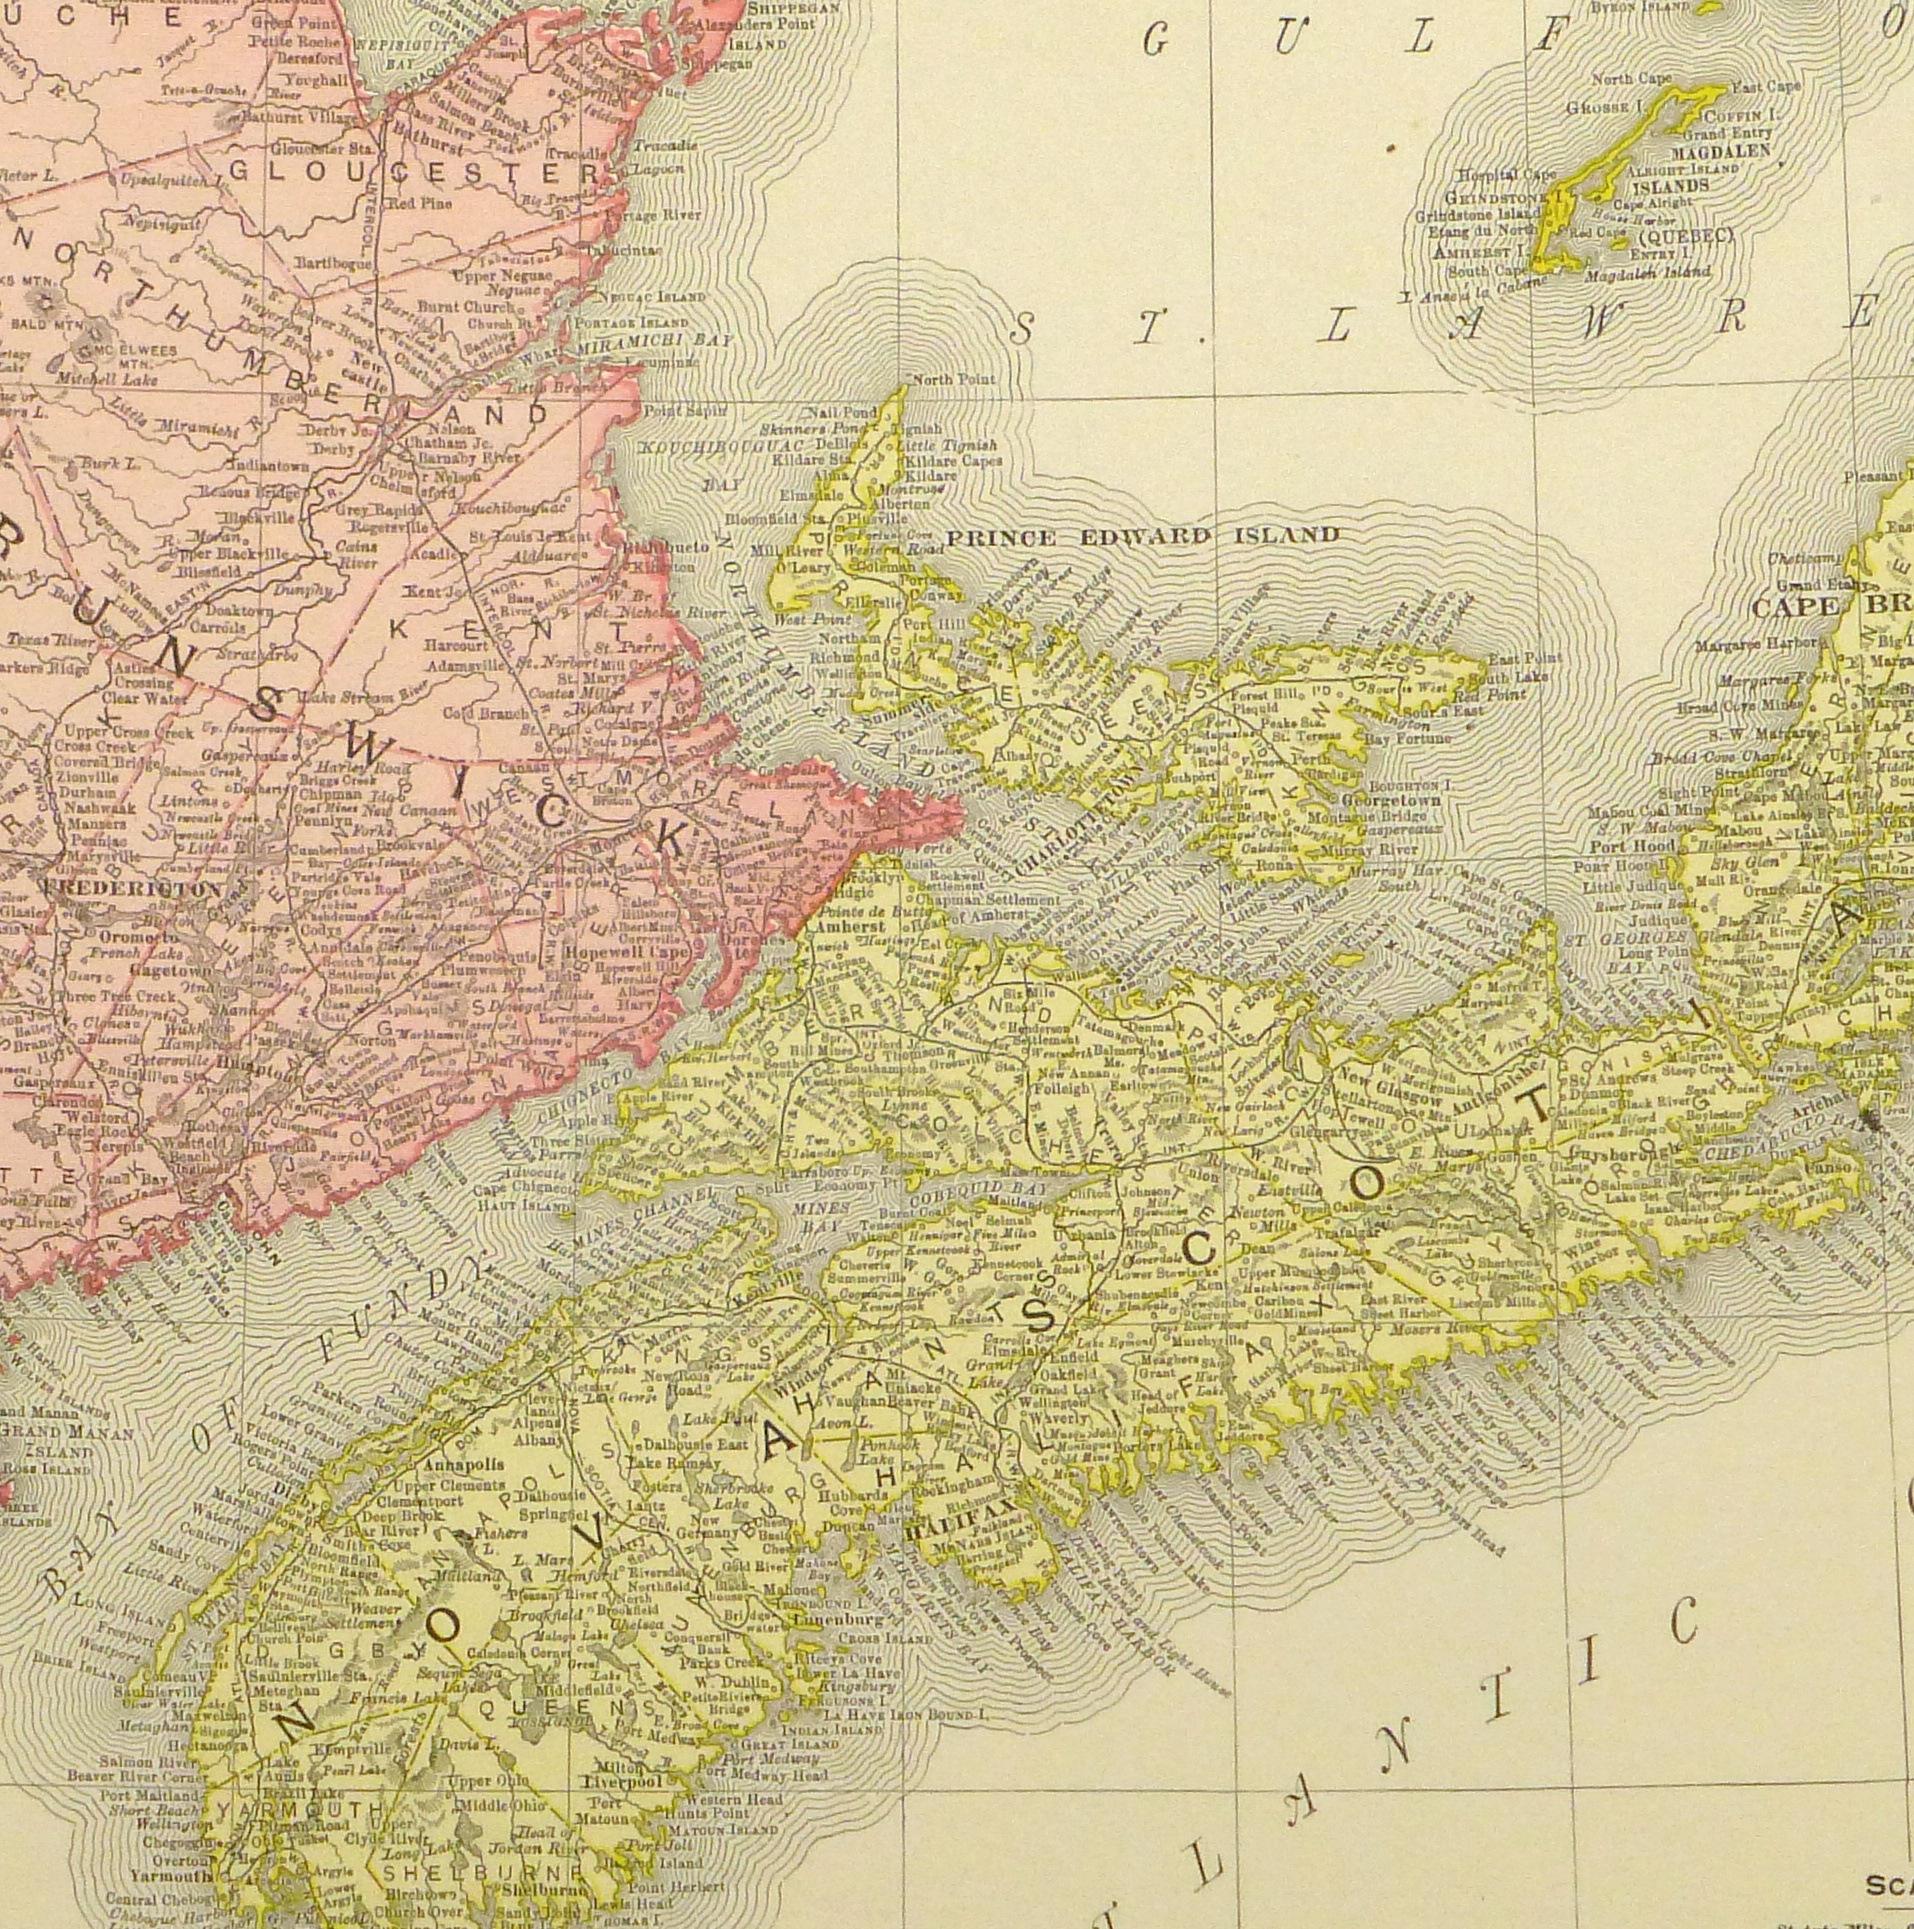 Maritime Provinces, Canada Map, 1895-detail-8553K